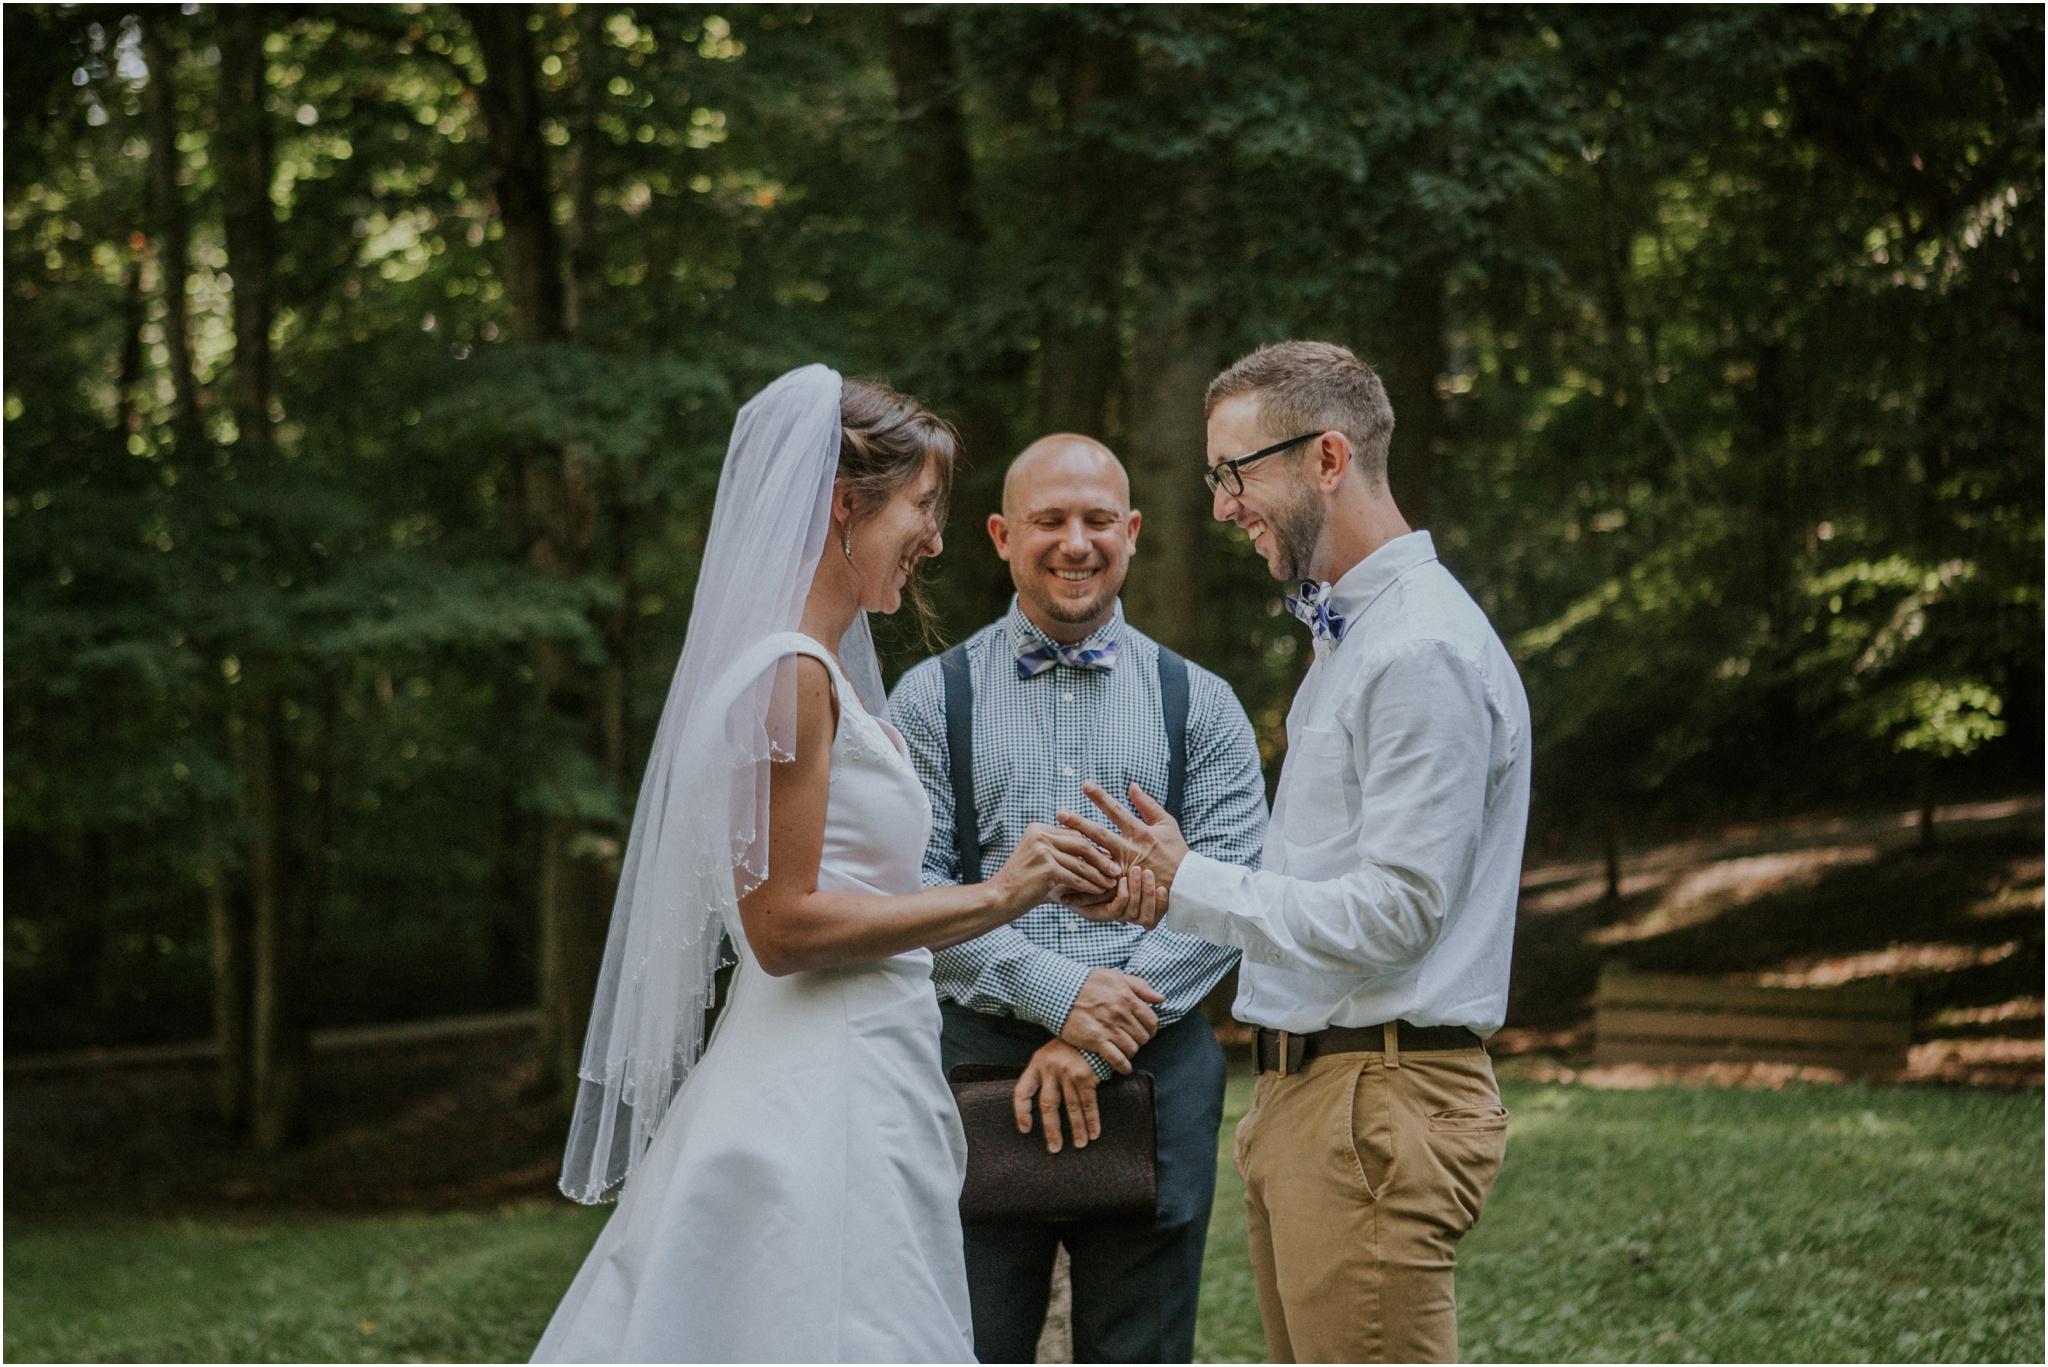 sugar-hollow-park-bristol-virginia-wedding-intimate-woodsy-black-forest-ceremony-adventurous-couple_0029.jpg